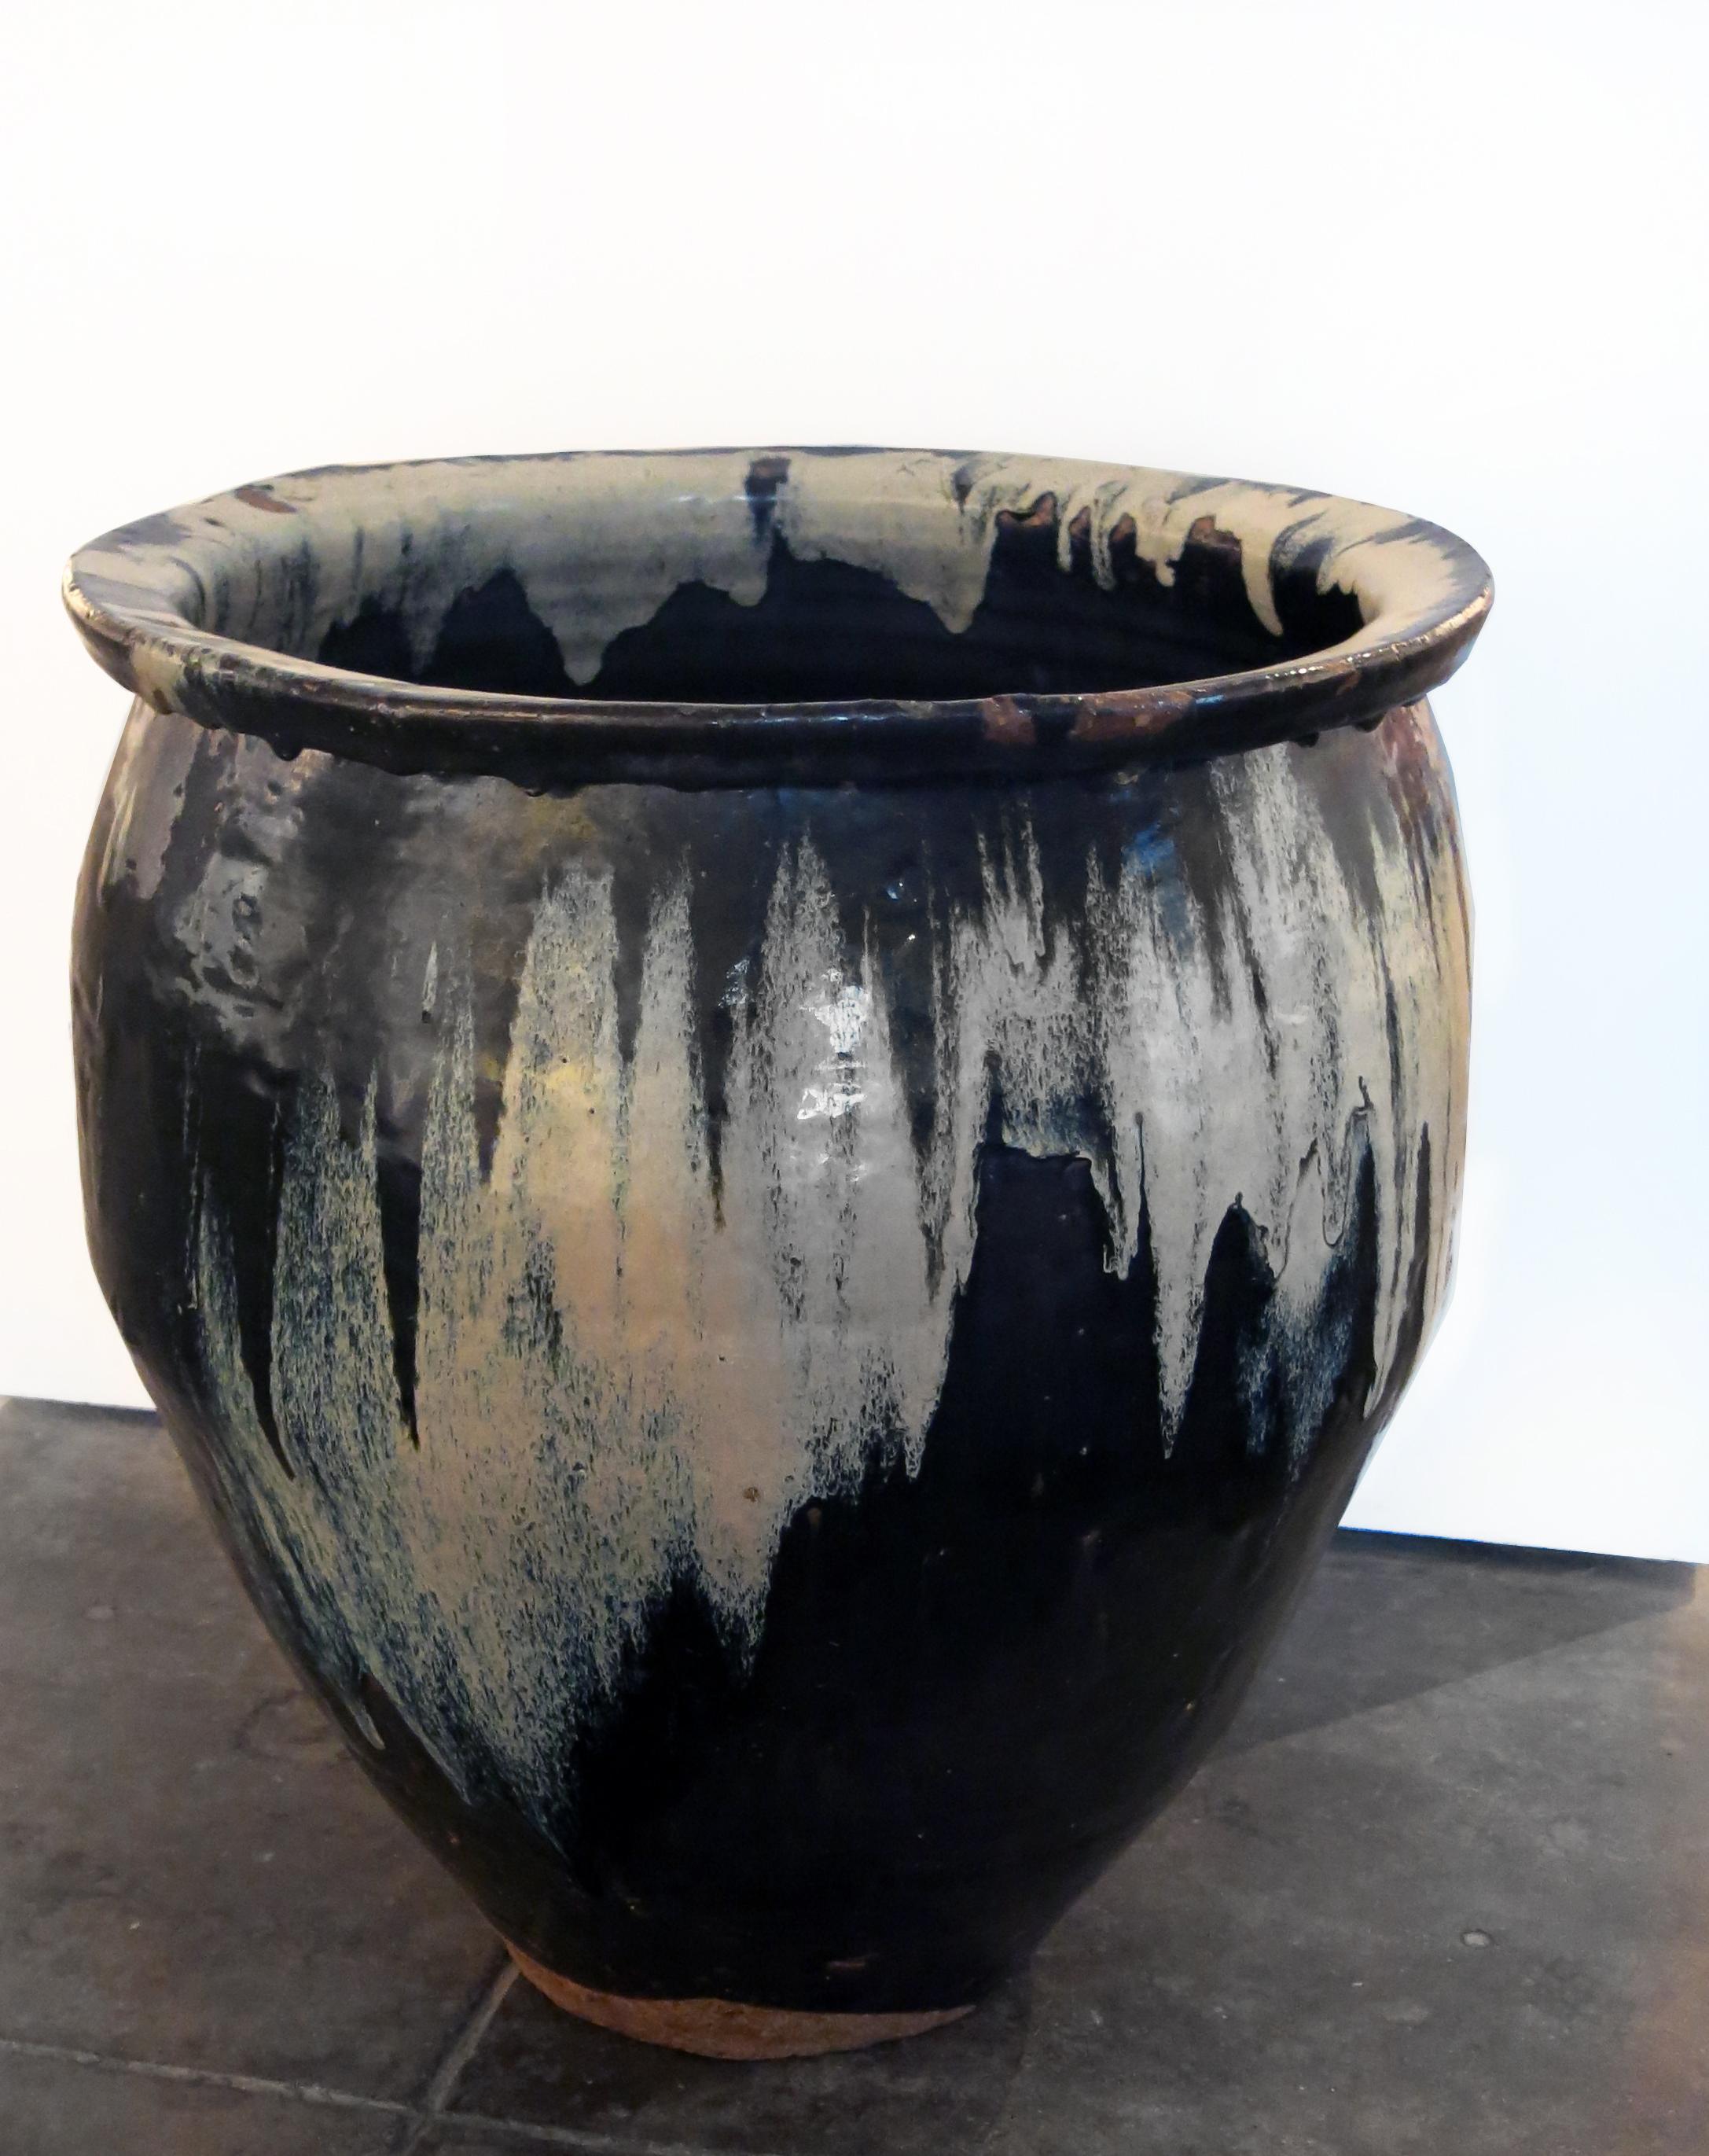 Japan, Urn, Edo period: 1800-1867, karatsu ware, 22.5h x 21d in.